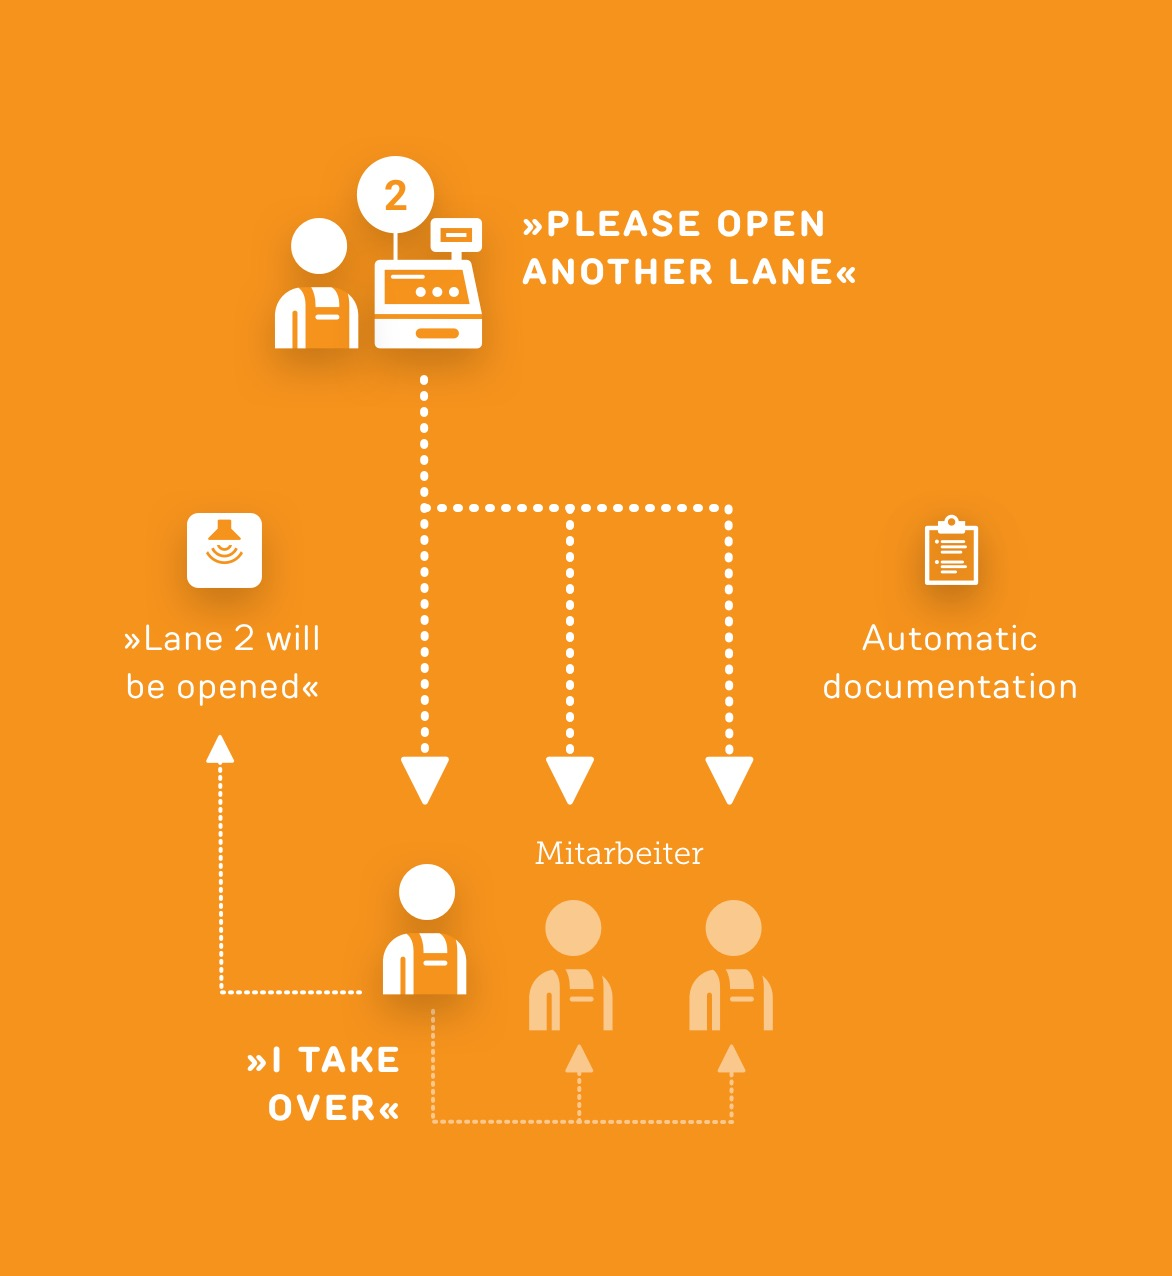 Cash register control system - Use case ReAct Retail